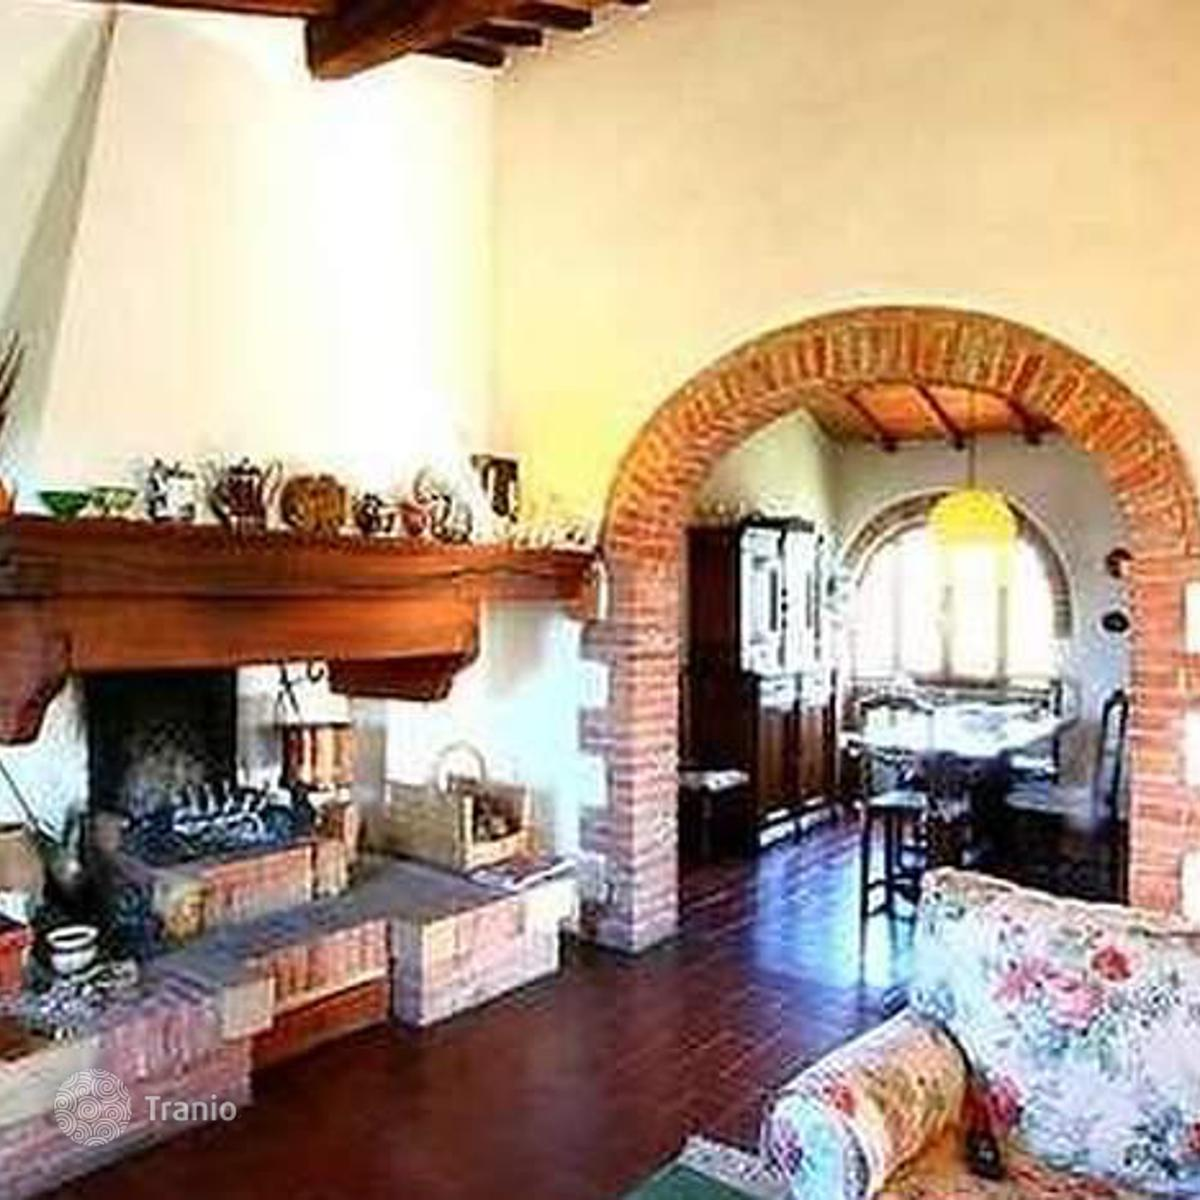 Listing #1097724 in Trequanda, Tuscany, Italy — Villa overseas ...